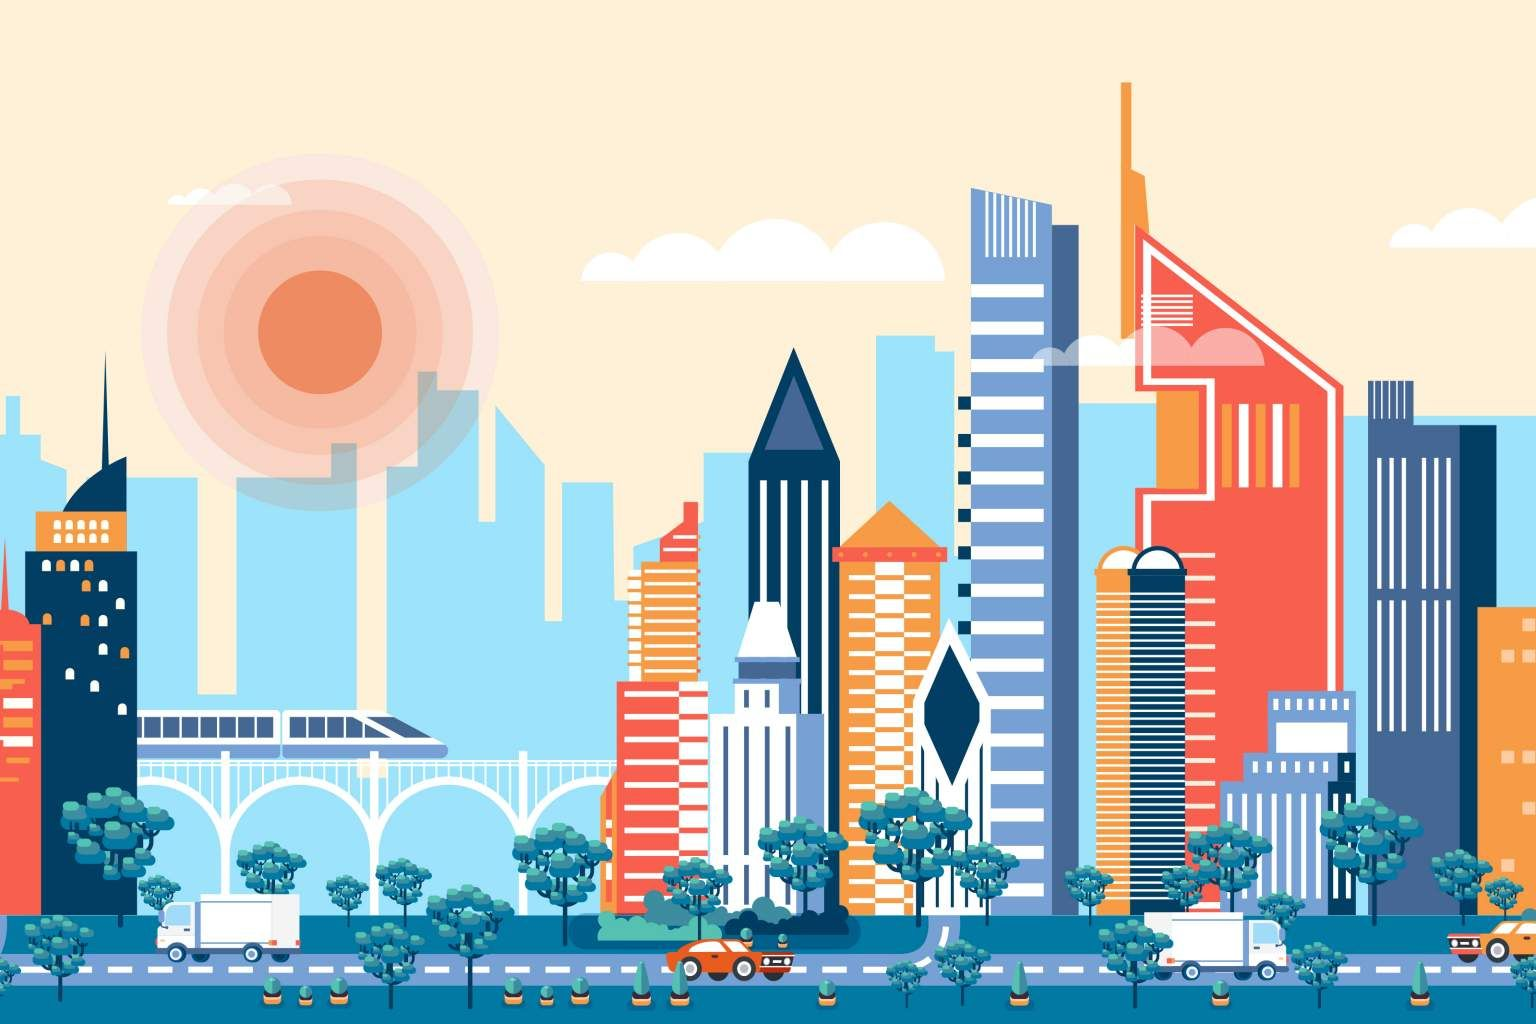 HPE_Smart_Cities.jpg